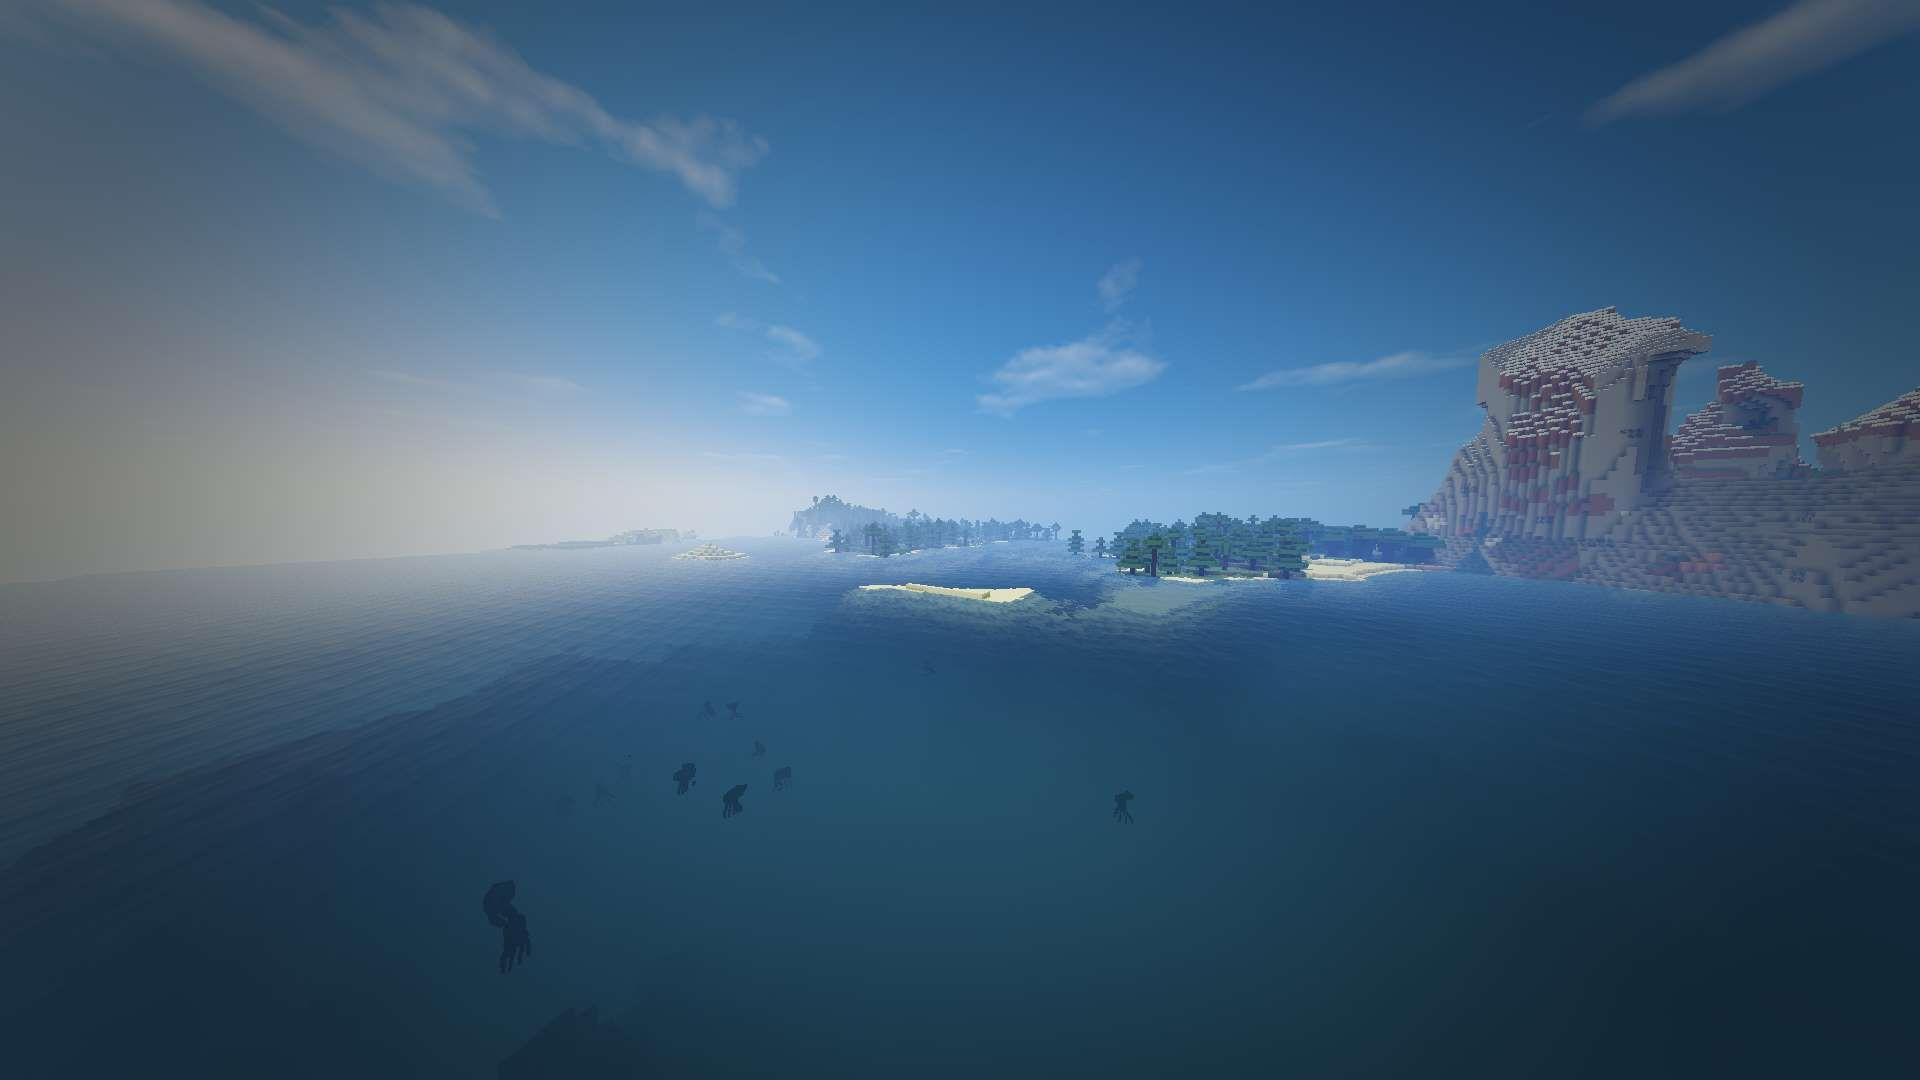 Top Wallpaper Minecraft Beach - 18a02f9974dfec19321ba59abf826172  Gallery_47613.jpg